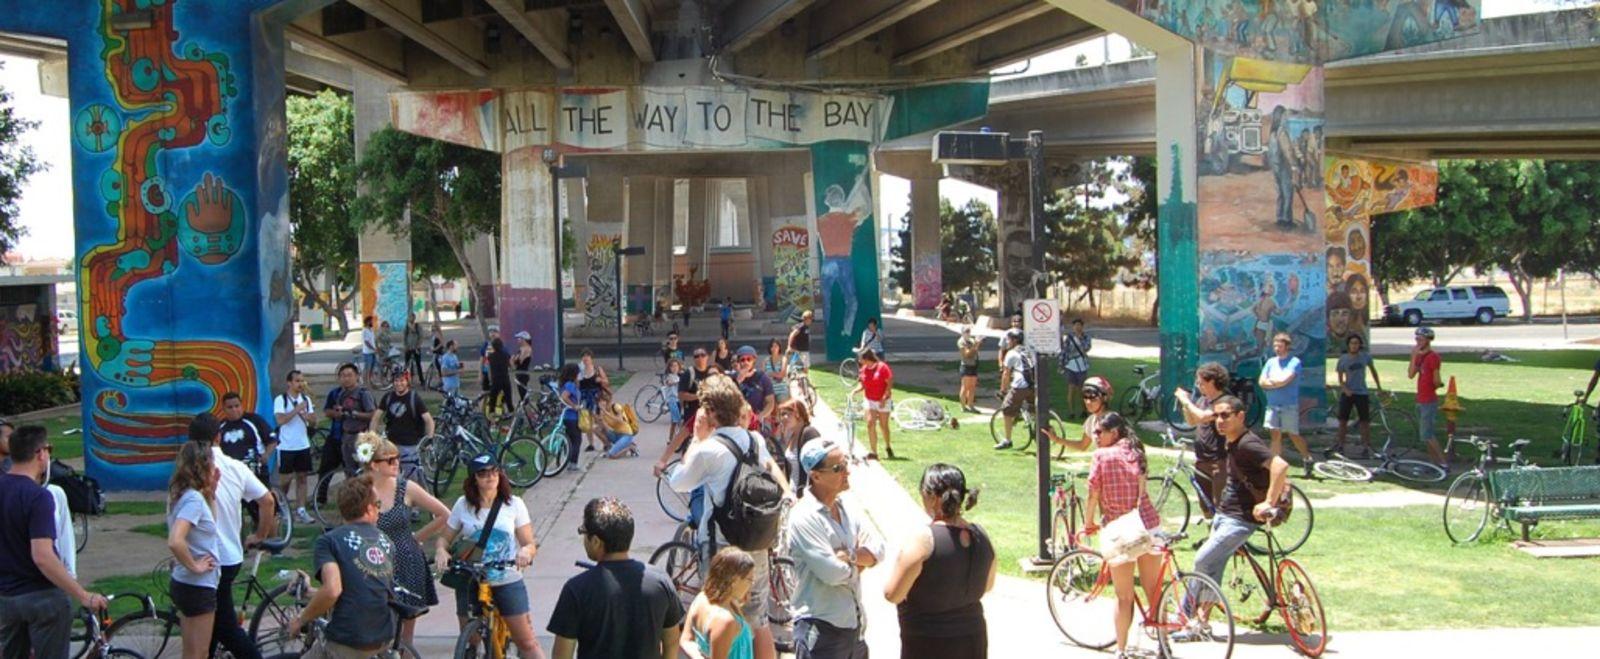 Bikers and pedestrians hang out under a street mural.